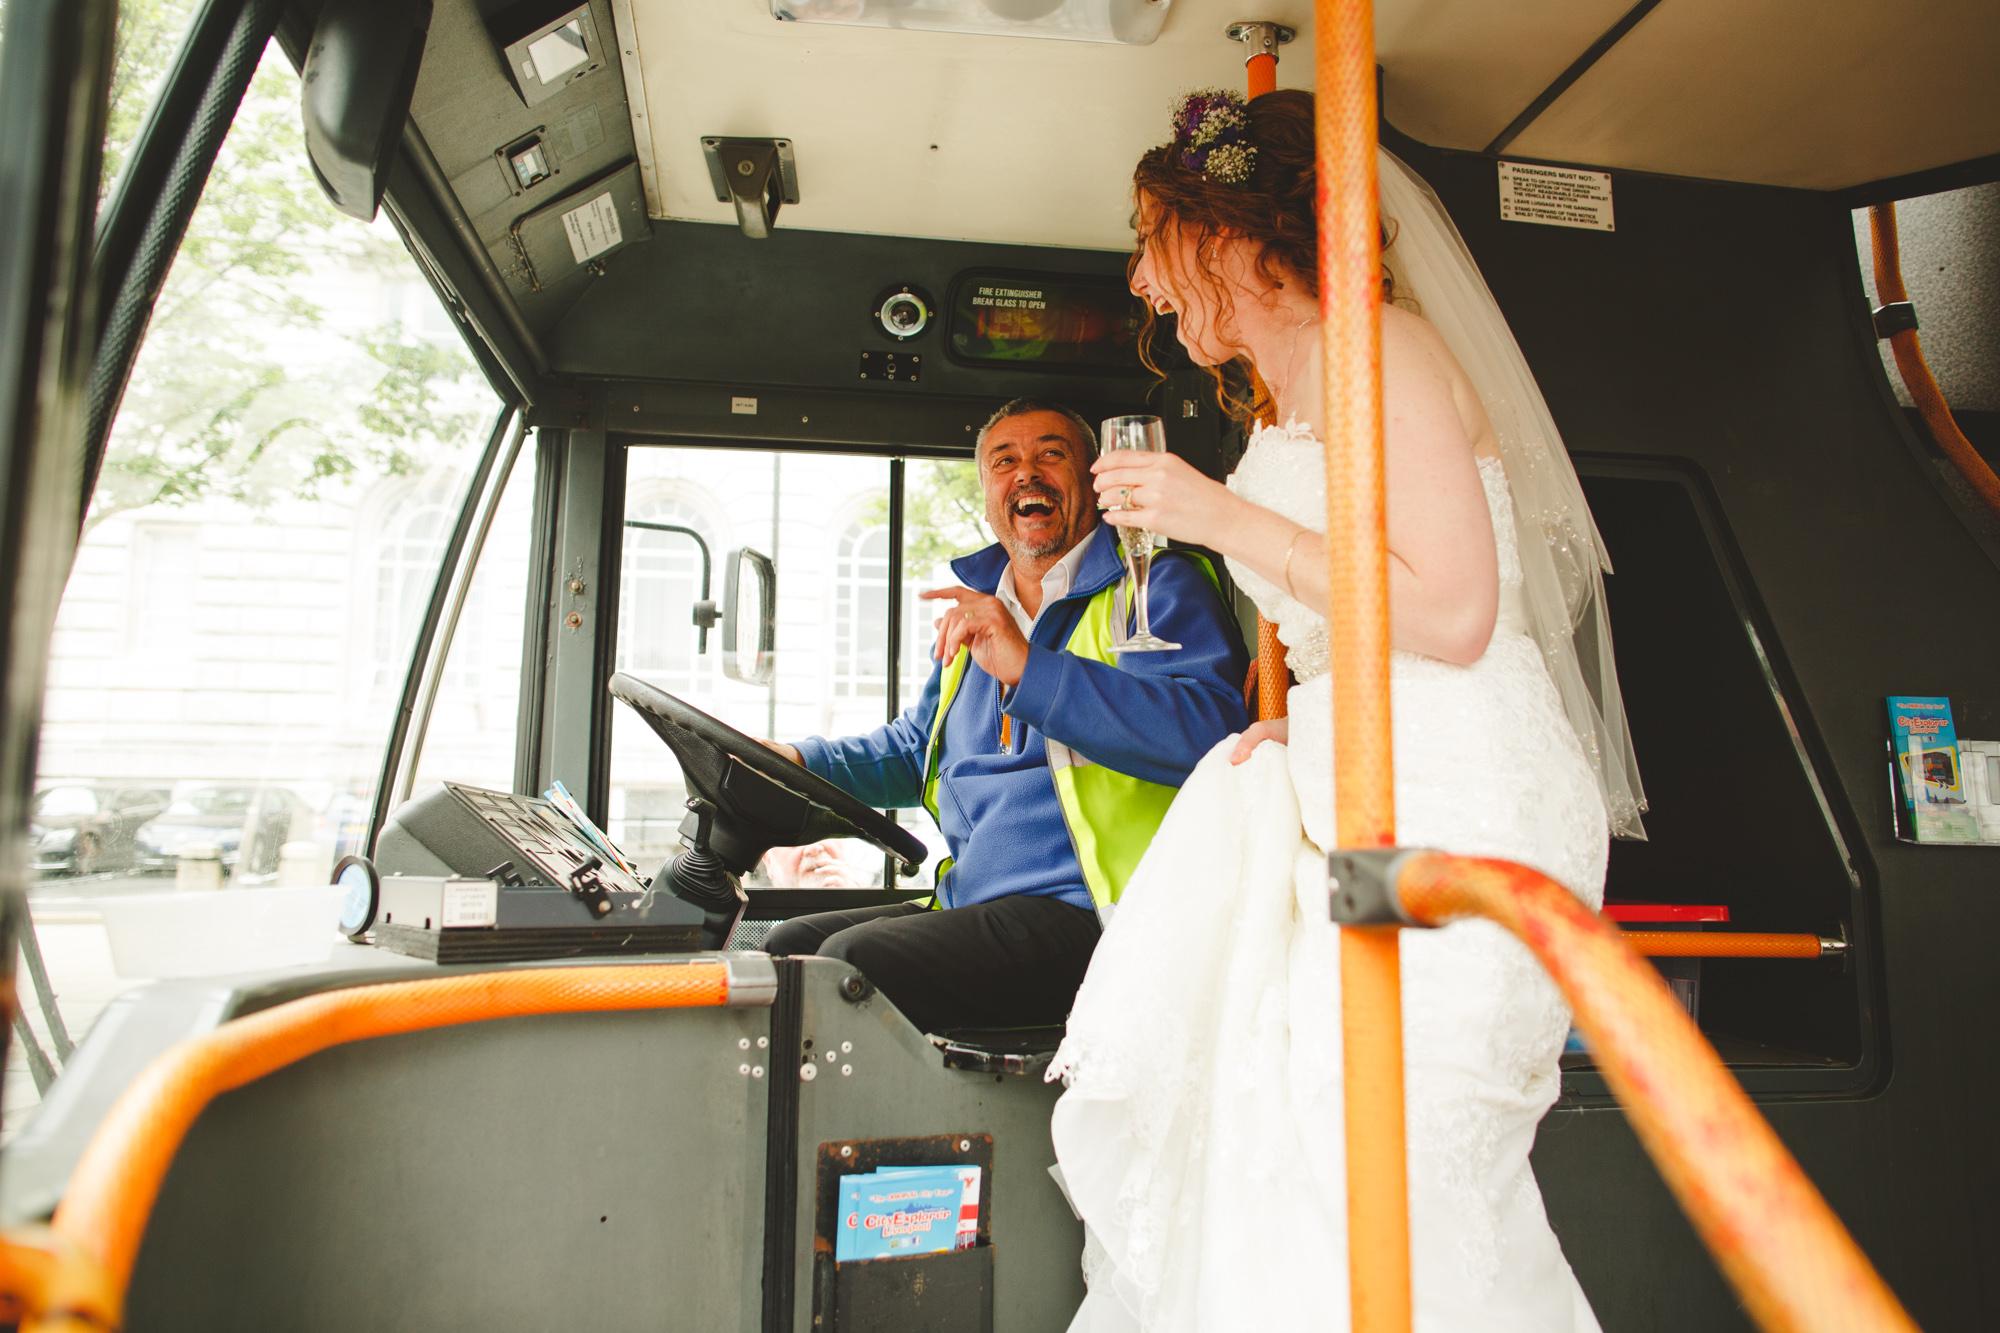 liverpool-town-hall-wedding-photography-12.jpg